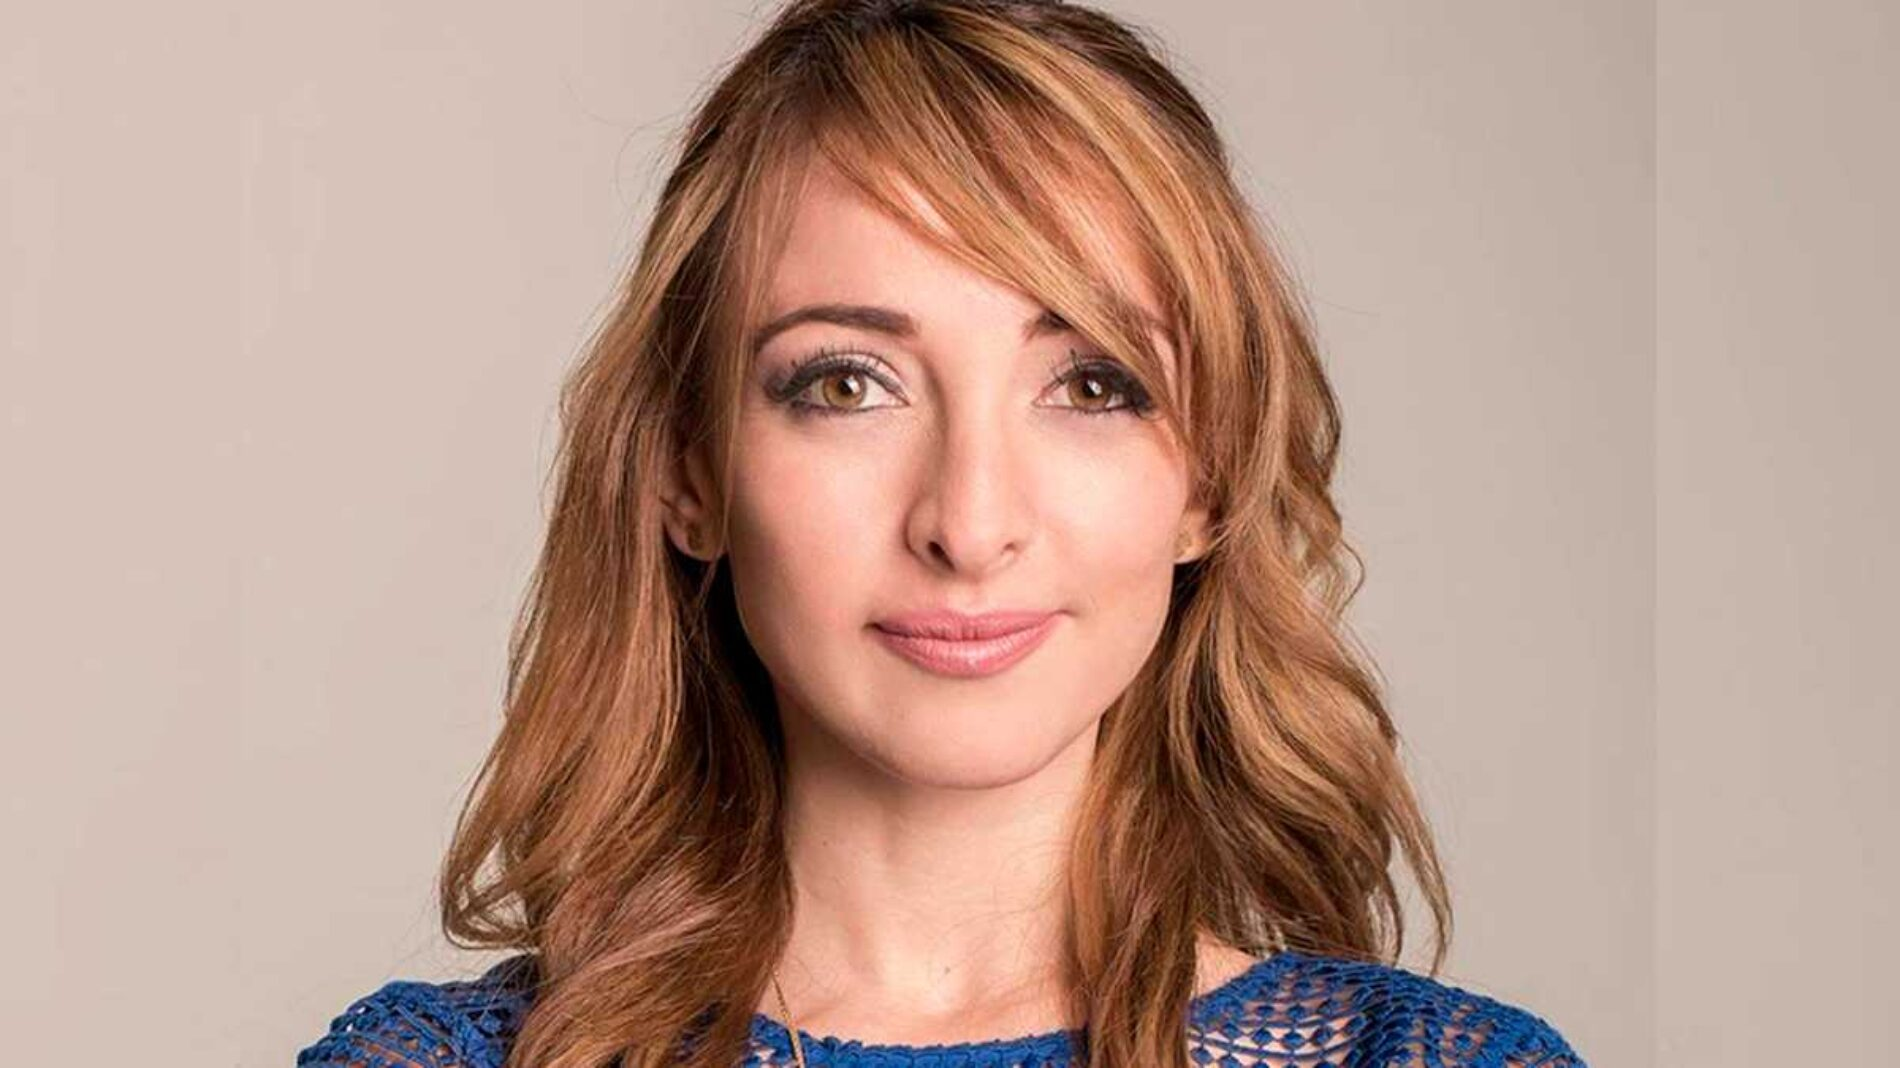 KATHERINE LOAIZA: MENTORA Y EXITOSA PROFESIONAL